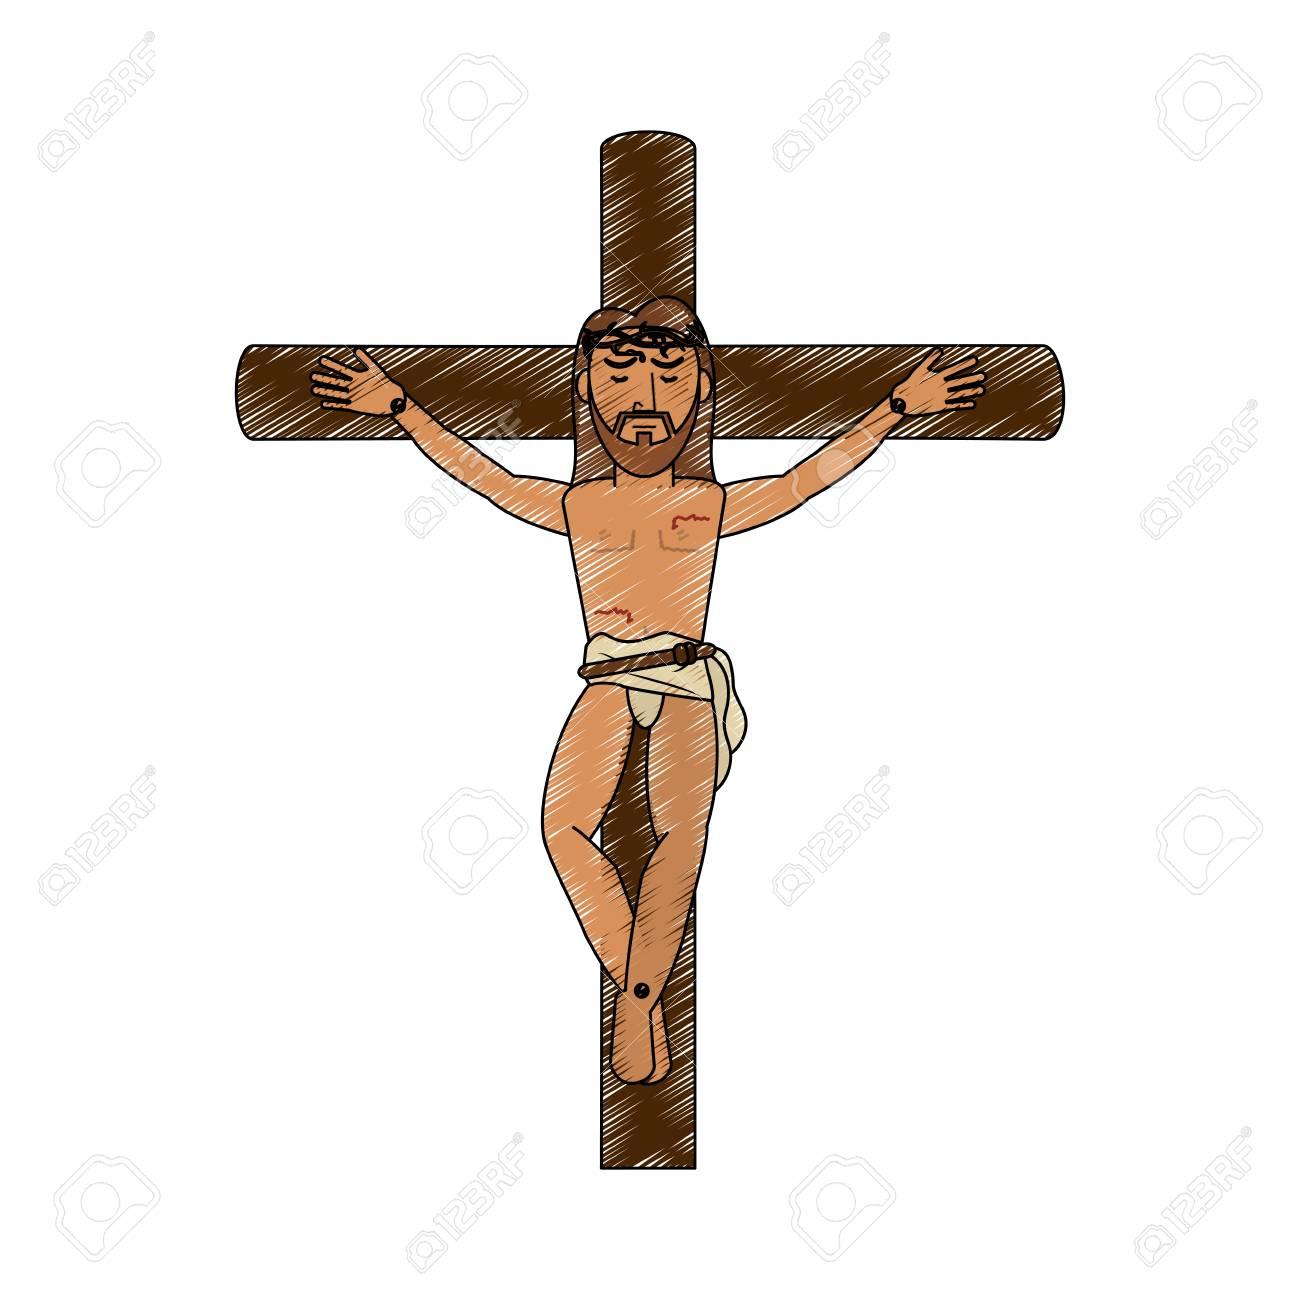 Crucified Jesus cartoon icon vector illustration graphic design - 92029854